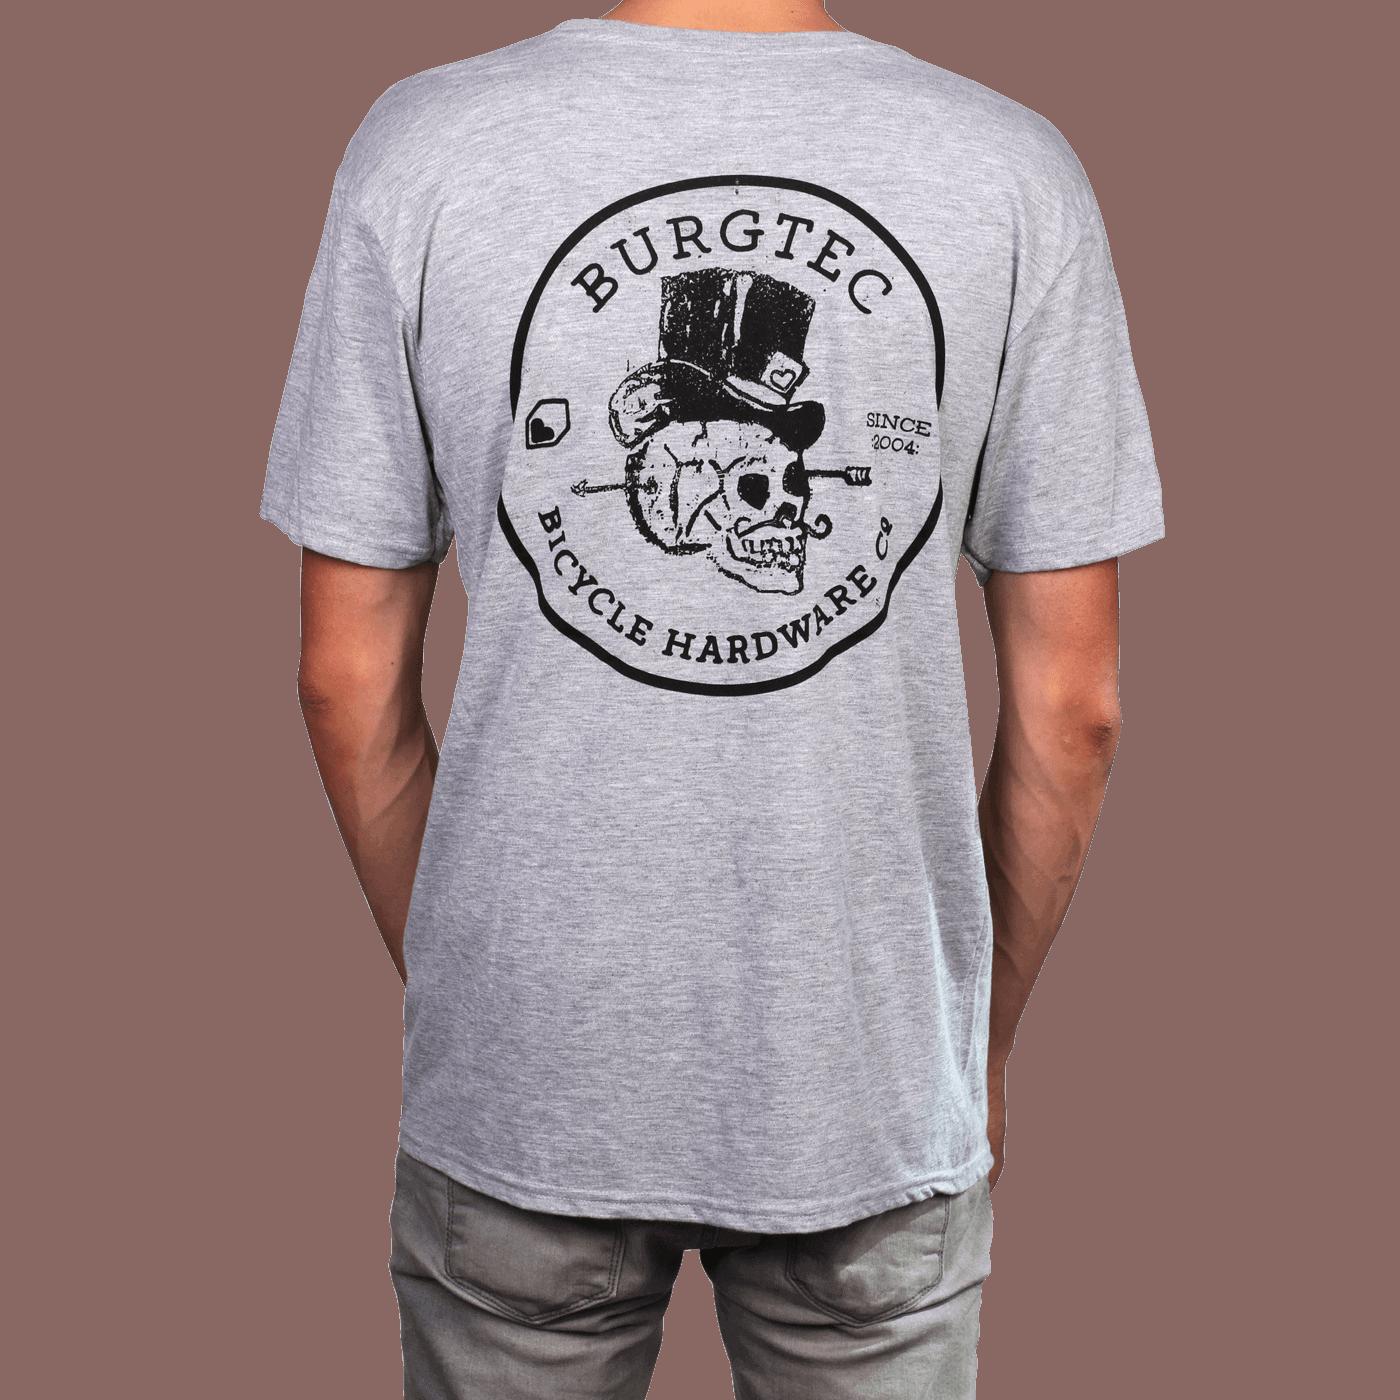 4a3d9add4fcc02 Burgtec Skull Hardware T-shirt - Burgtec